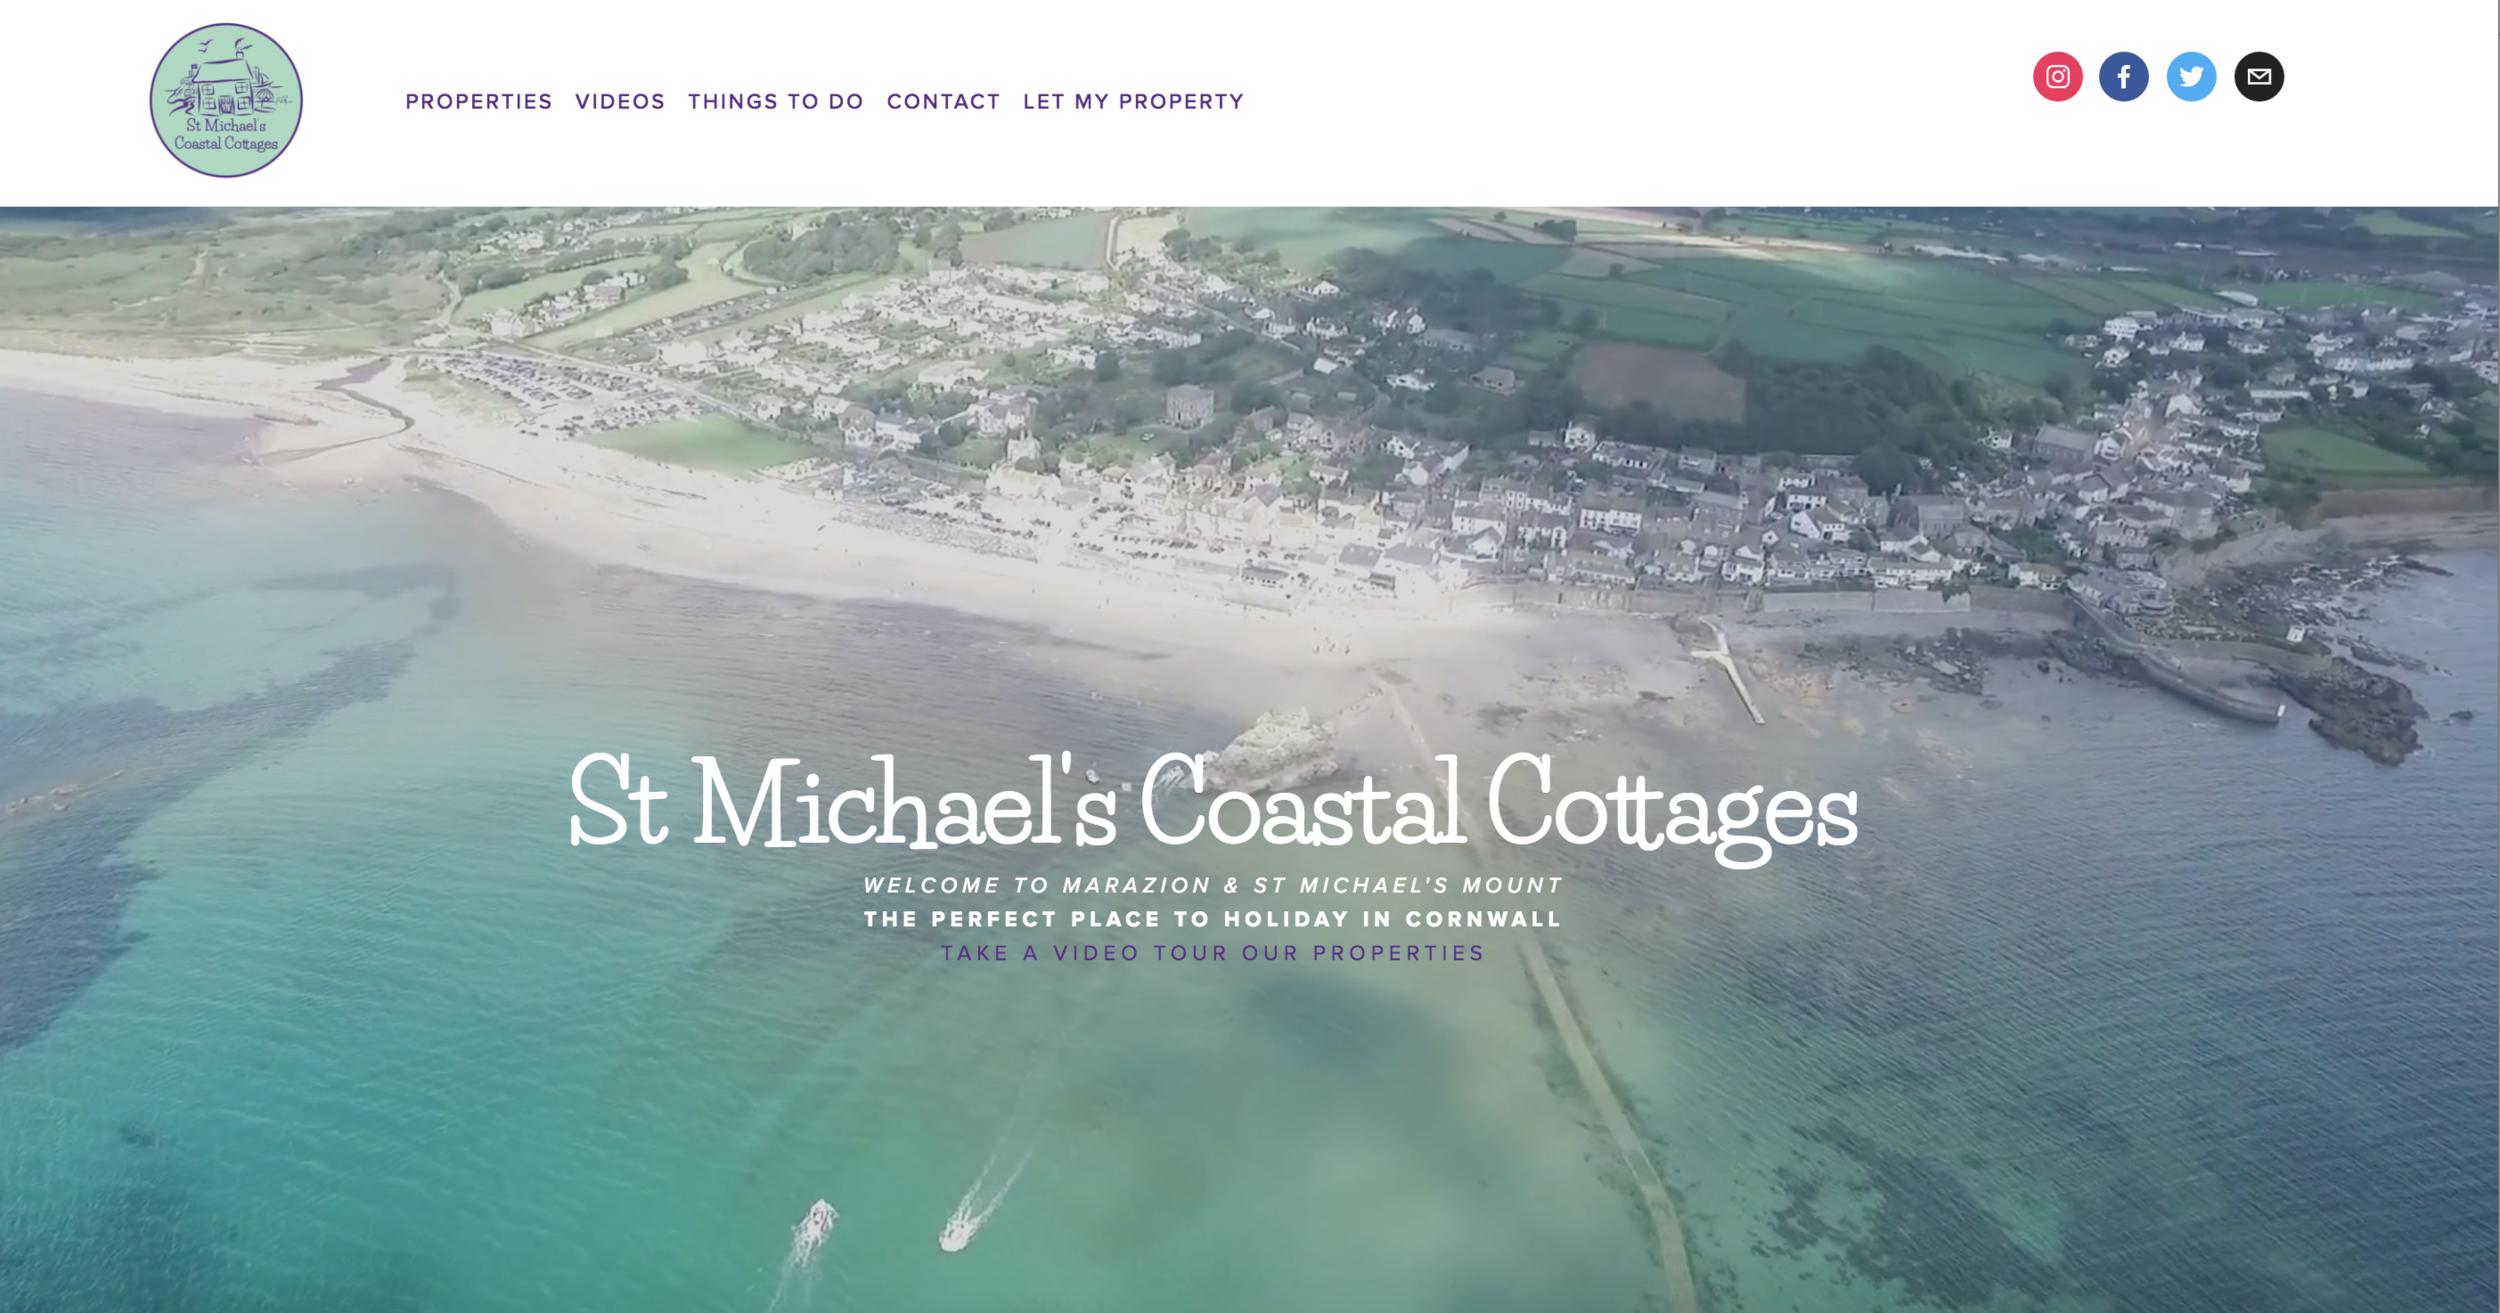 st-michaels-coastal-cottages-cornwall